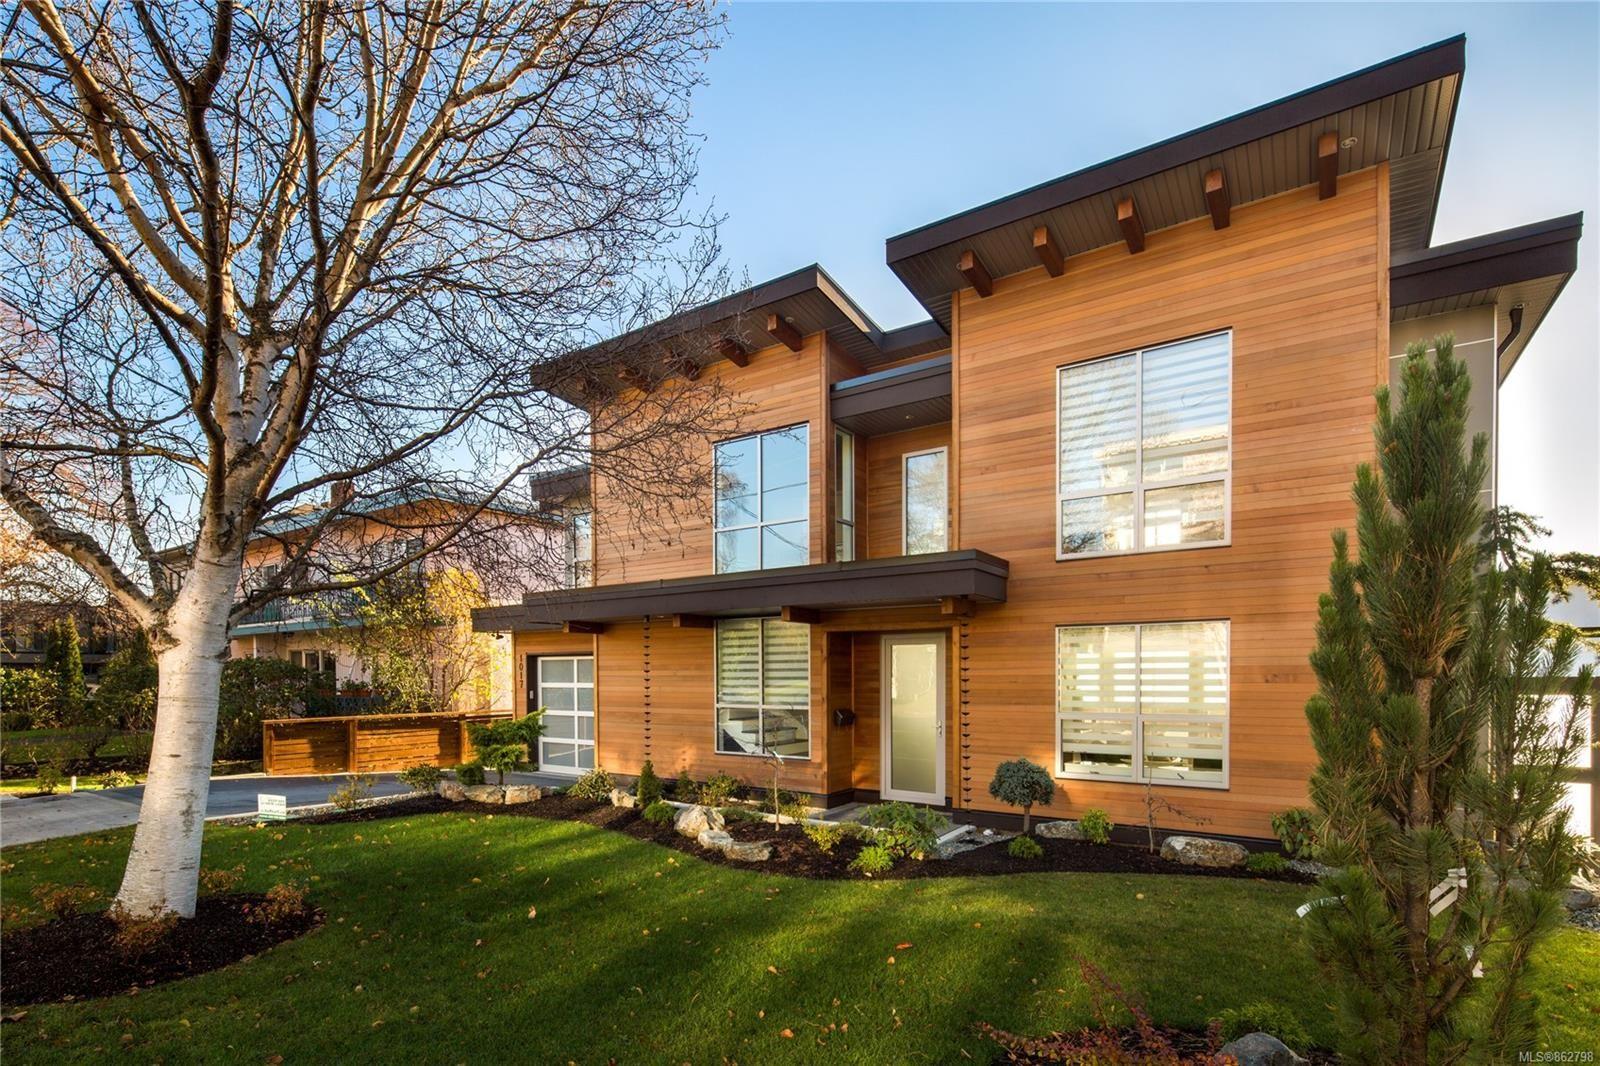 Main Photo: 1017 Pakington St in : Vi Fairfield West House for sale (Victoria)  : MLS®# 862798